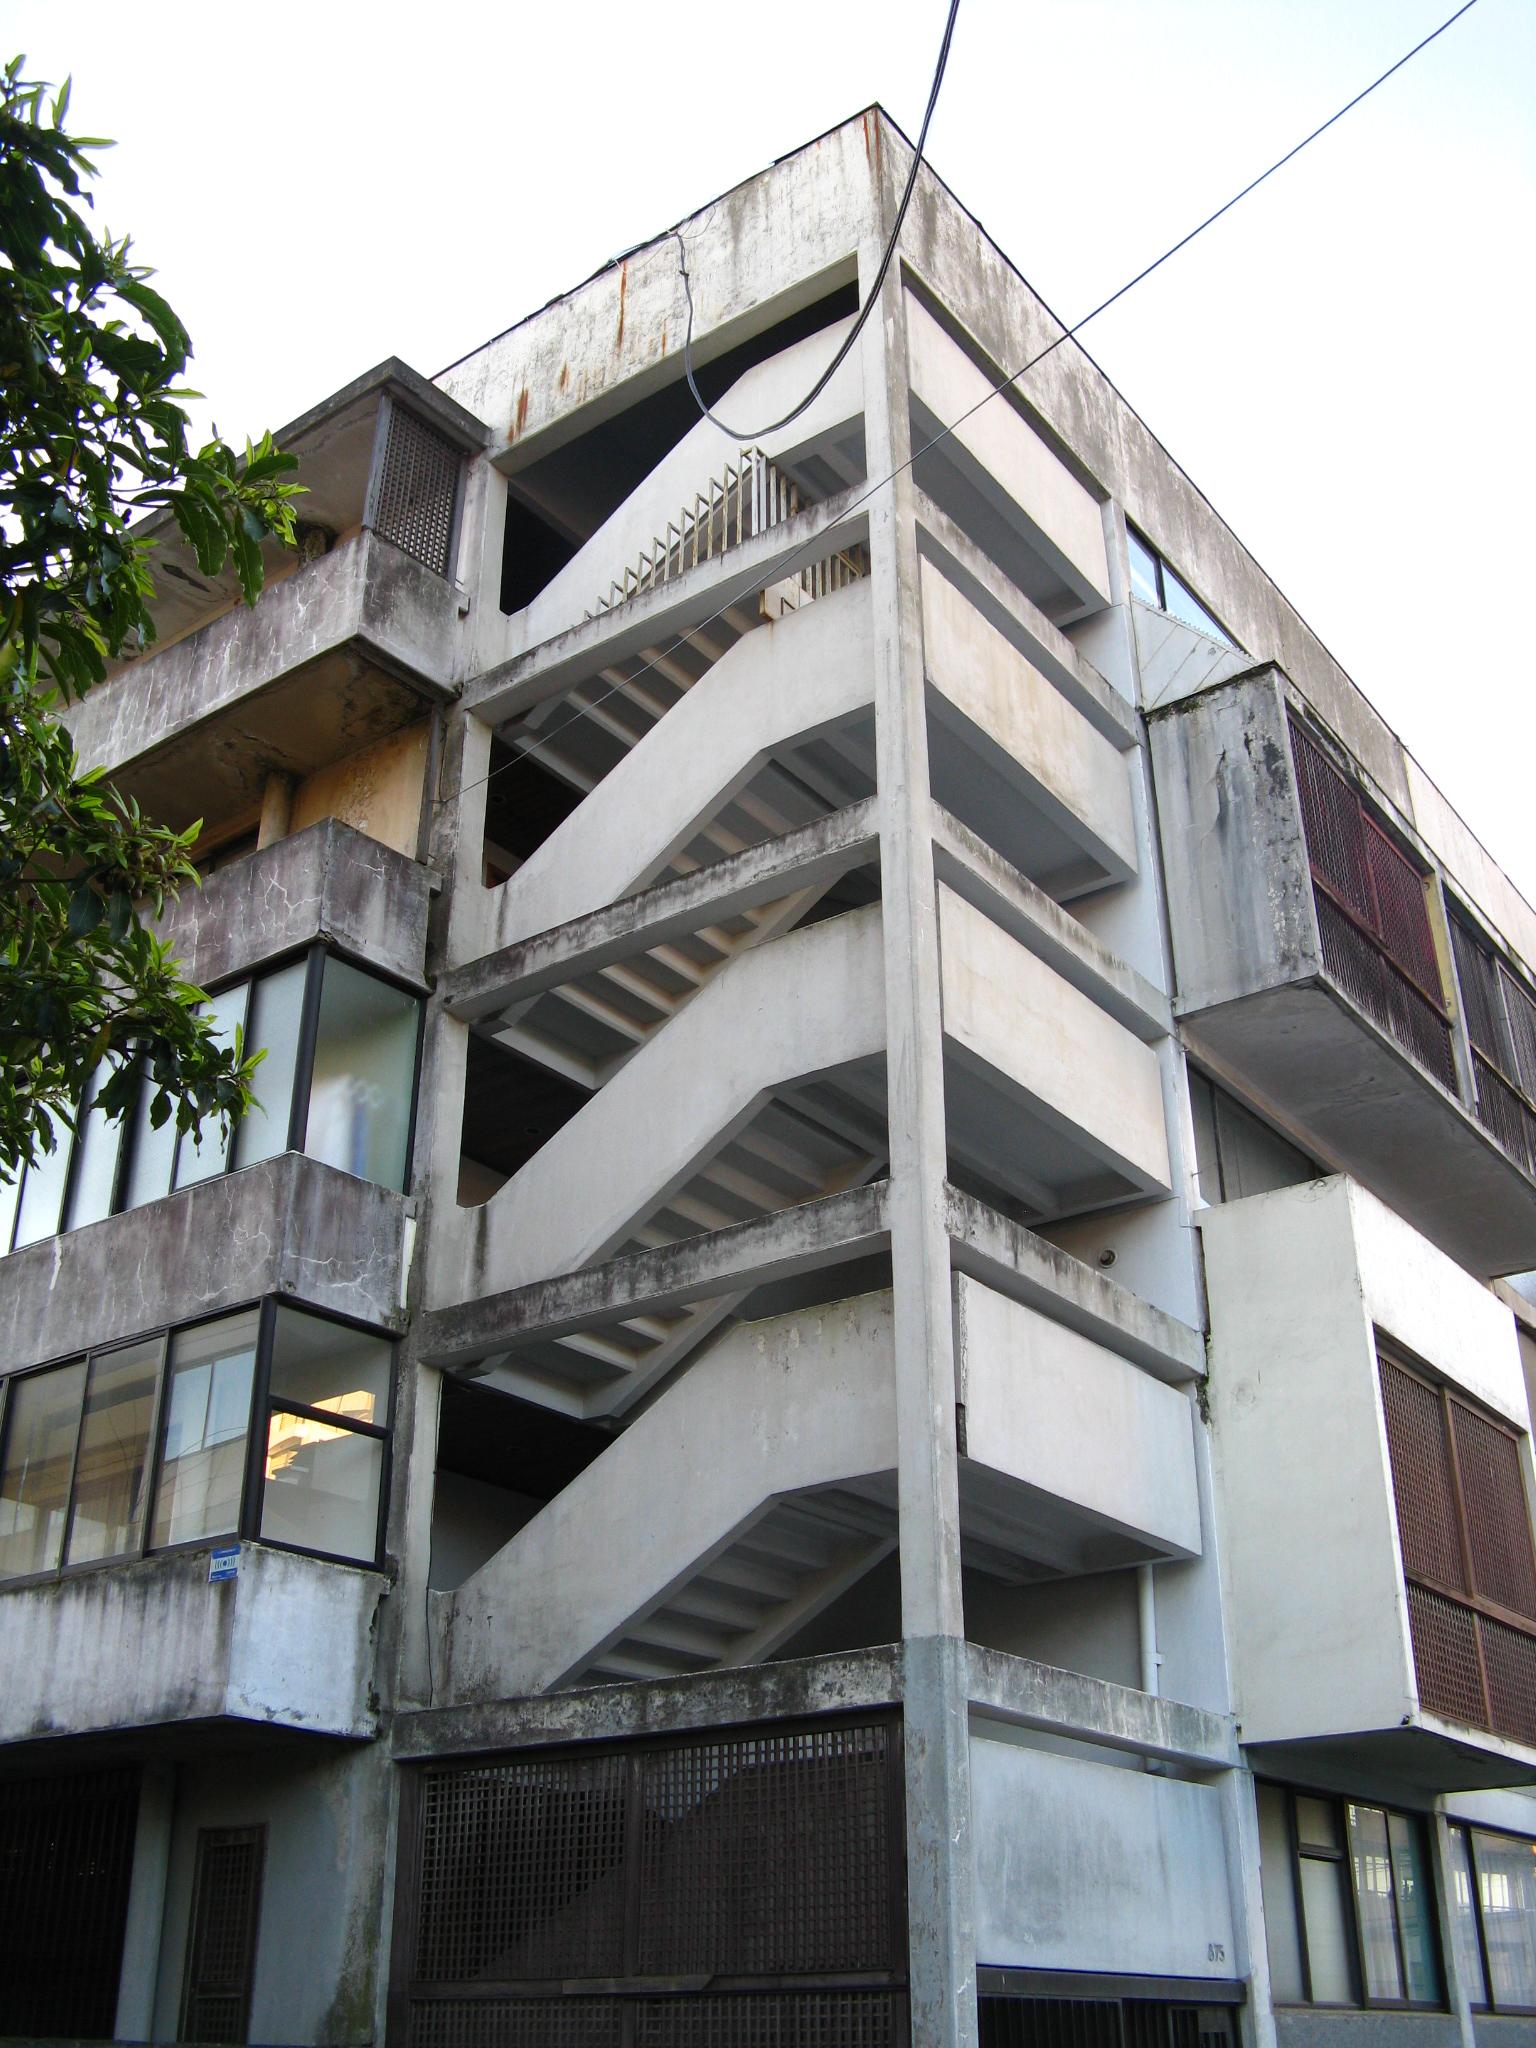 File edificio arauco escaleras jpg - Escaleras de interior modernas ...